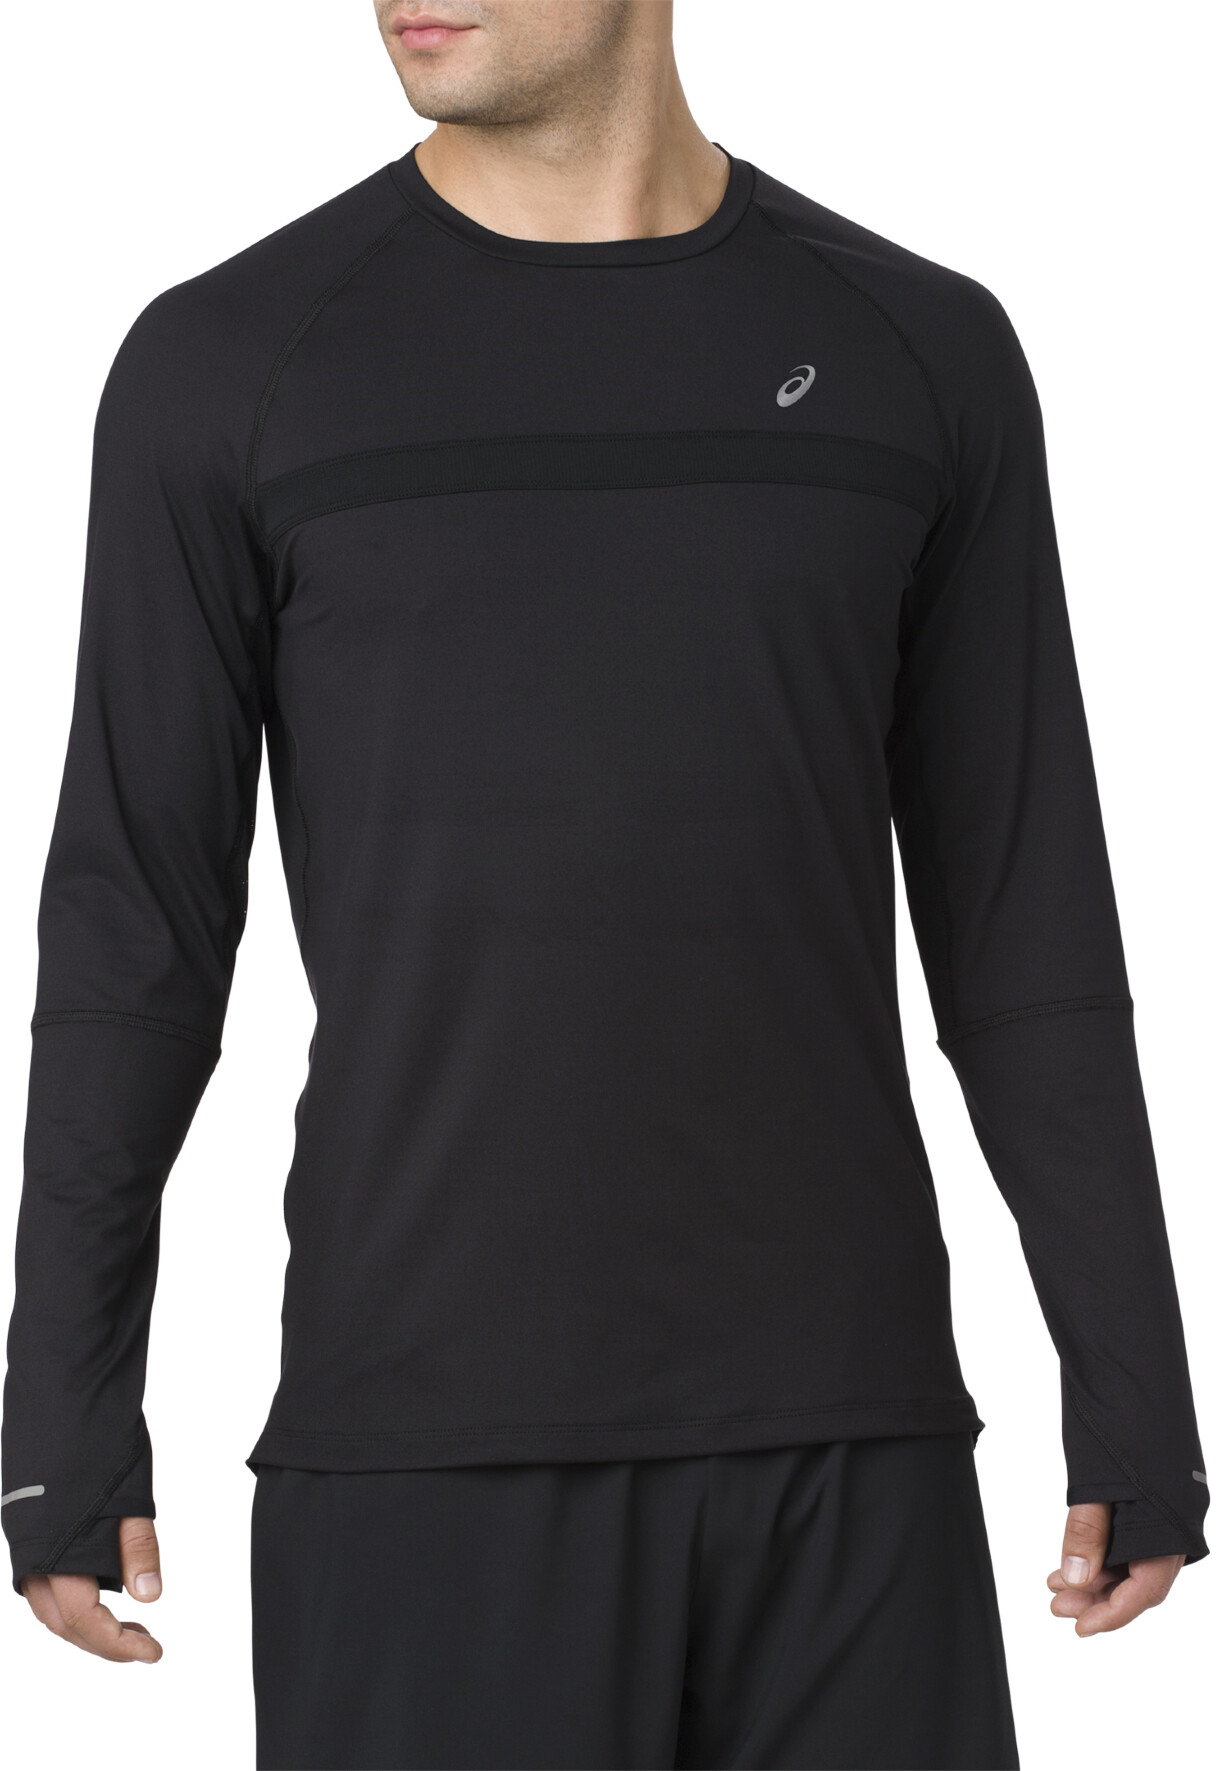 b4db3a6bf asics Thermopolis Plus - Camiseta manga larga running Hombre - negro ...